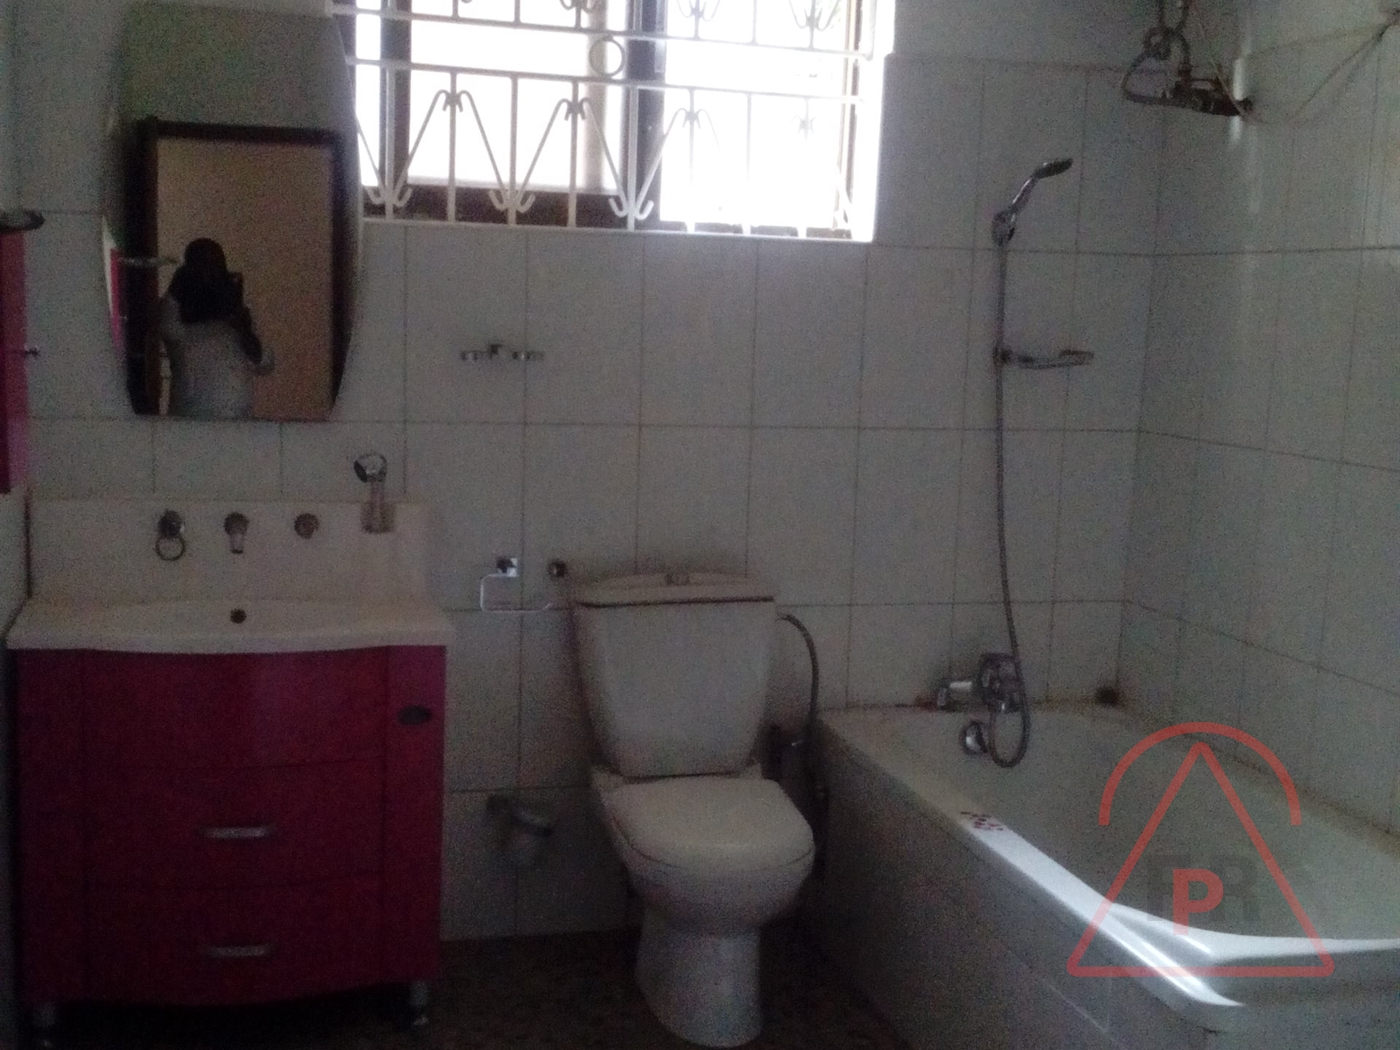 Bathroom (Toilet)